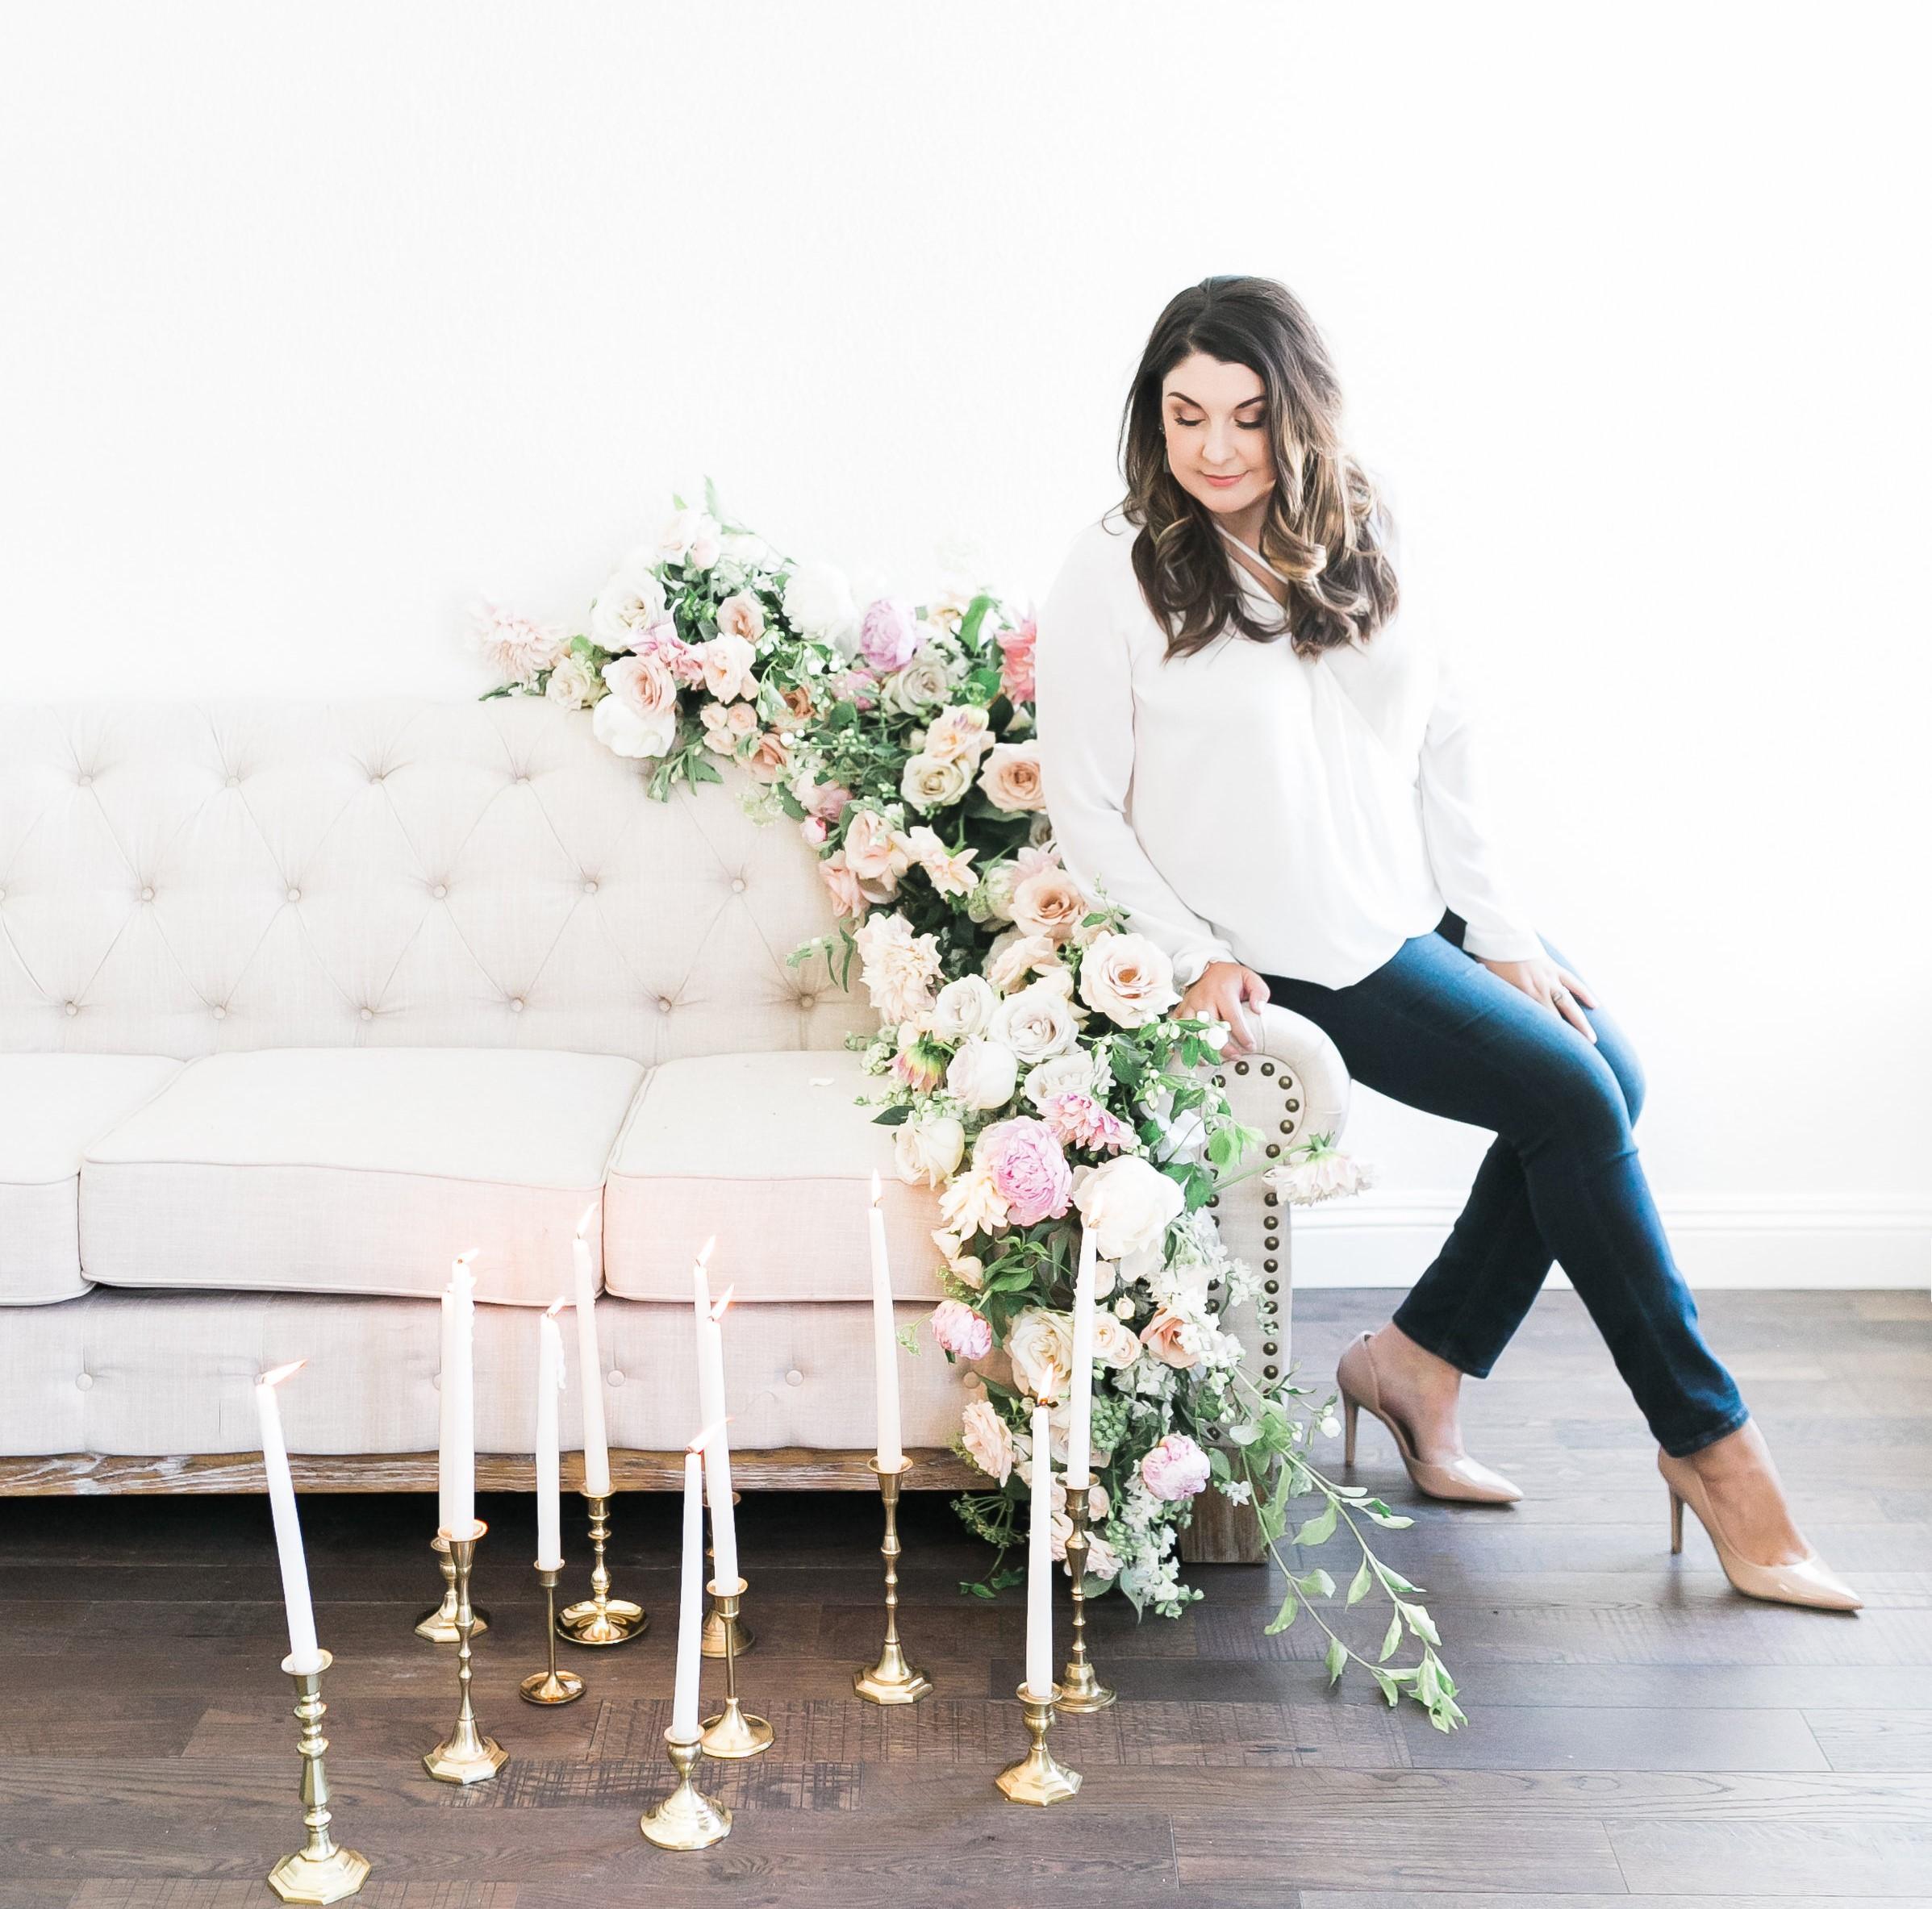 Las Vegas Wedding Planner Angelica Rose Events (2).jpg